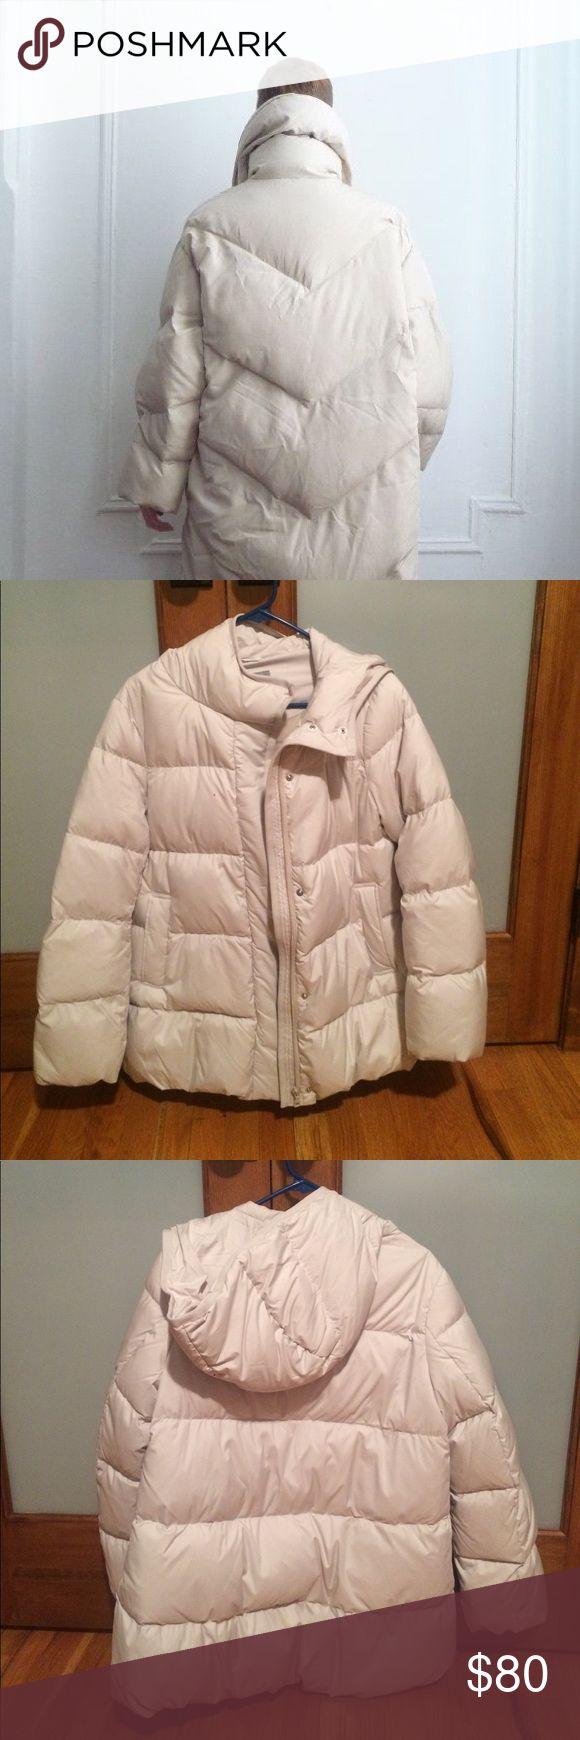 UNIQLO Puffer NWOT UNIQLO cream colored puffer coat with hood. Size medium. Zipper closure with snaps. No trades. Uniqlo Jackets & Coats Puffers